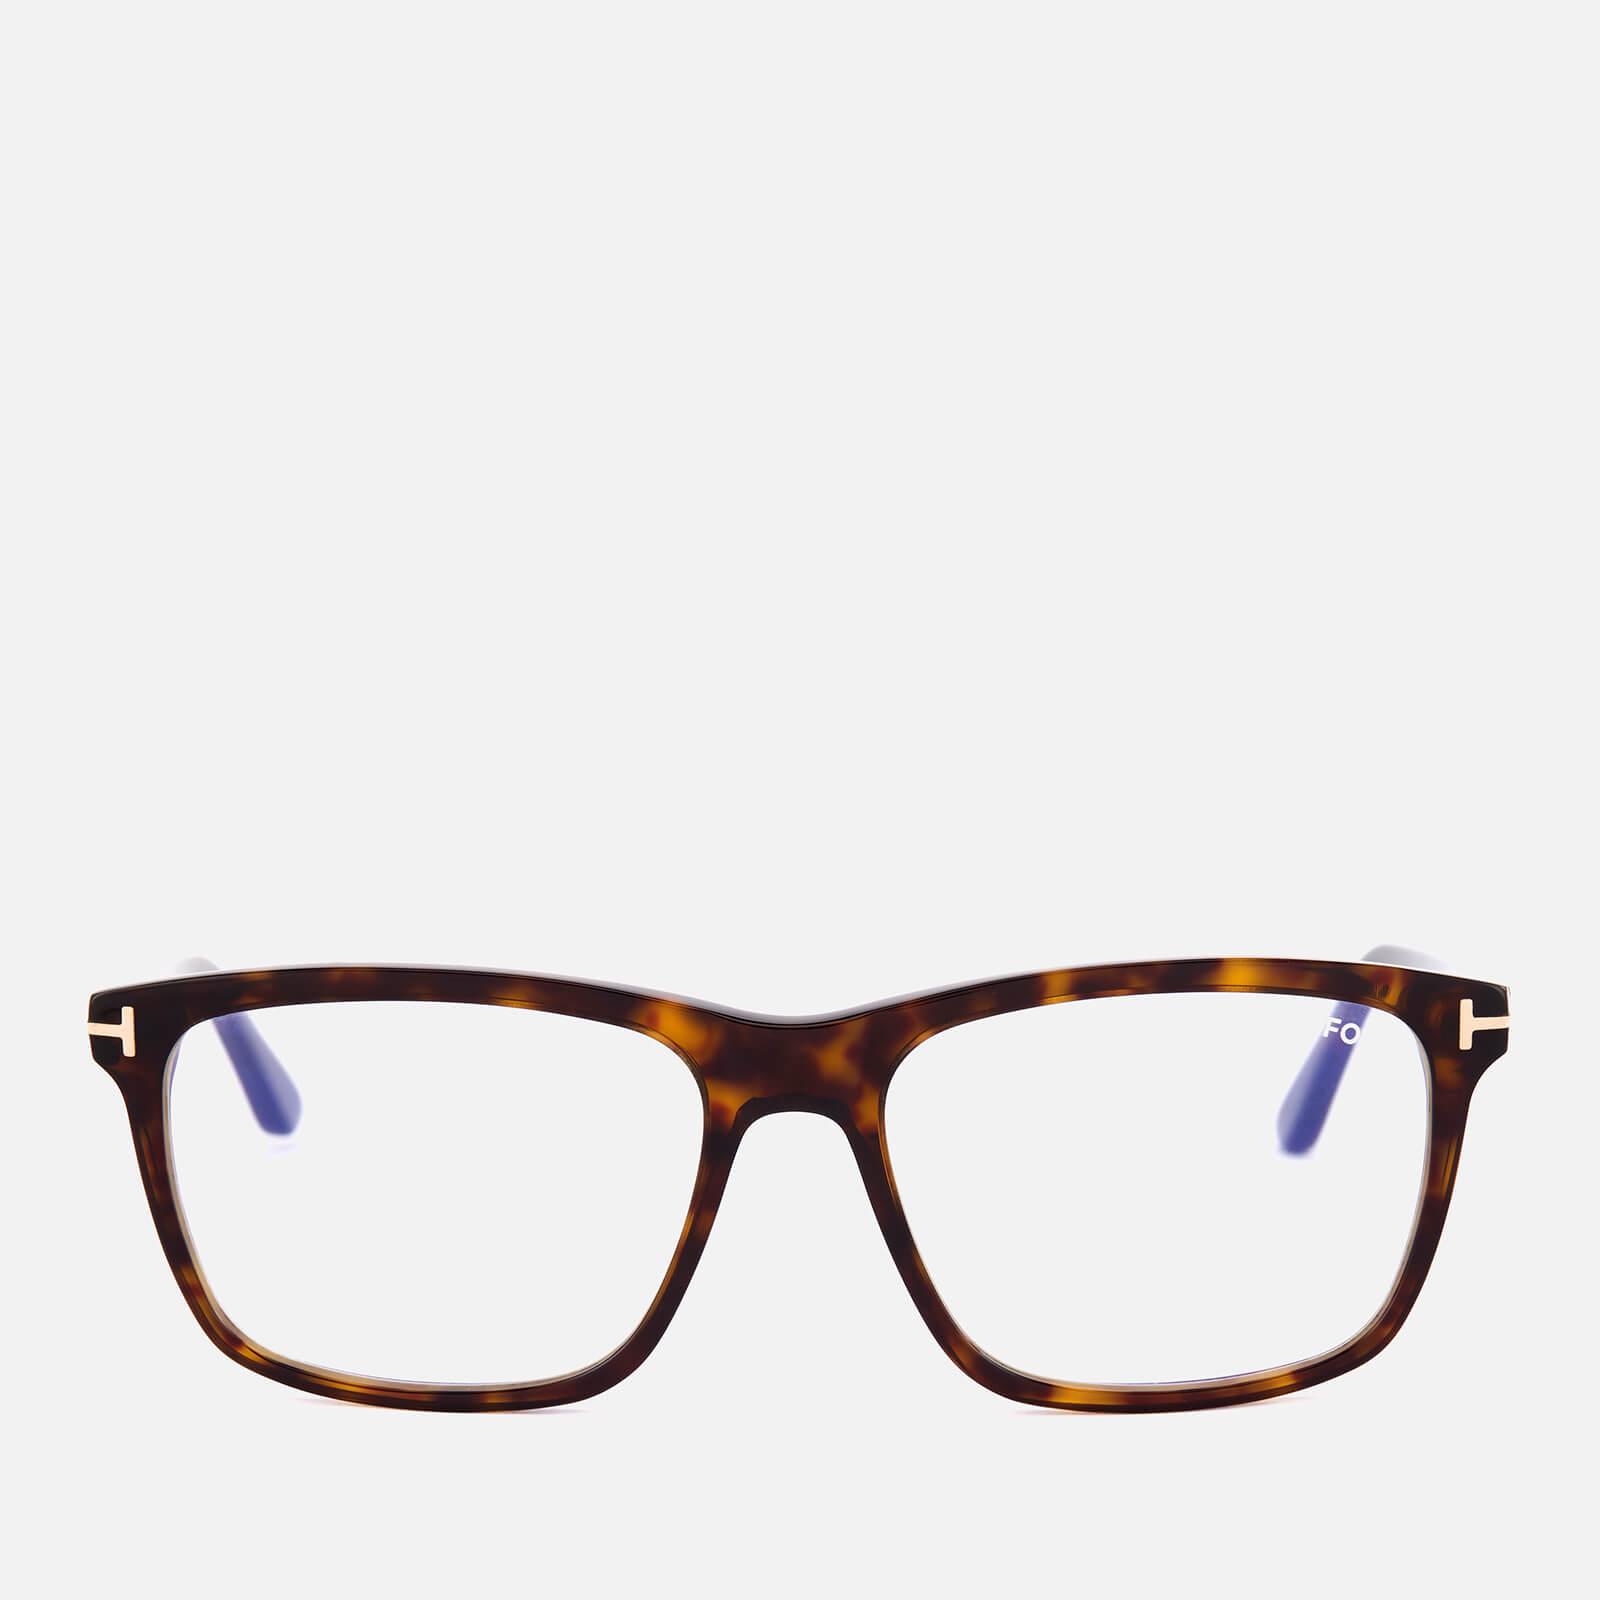 0a7d21cbf2 Tom Ford Men s Blue Block Square Glasses - Dark Havana Mens Accessories